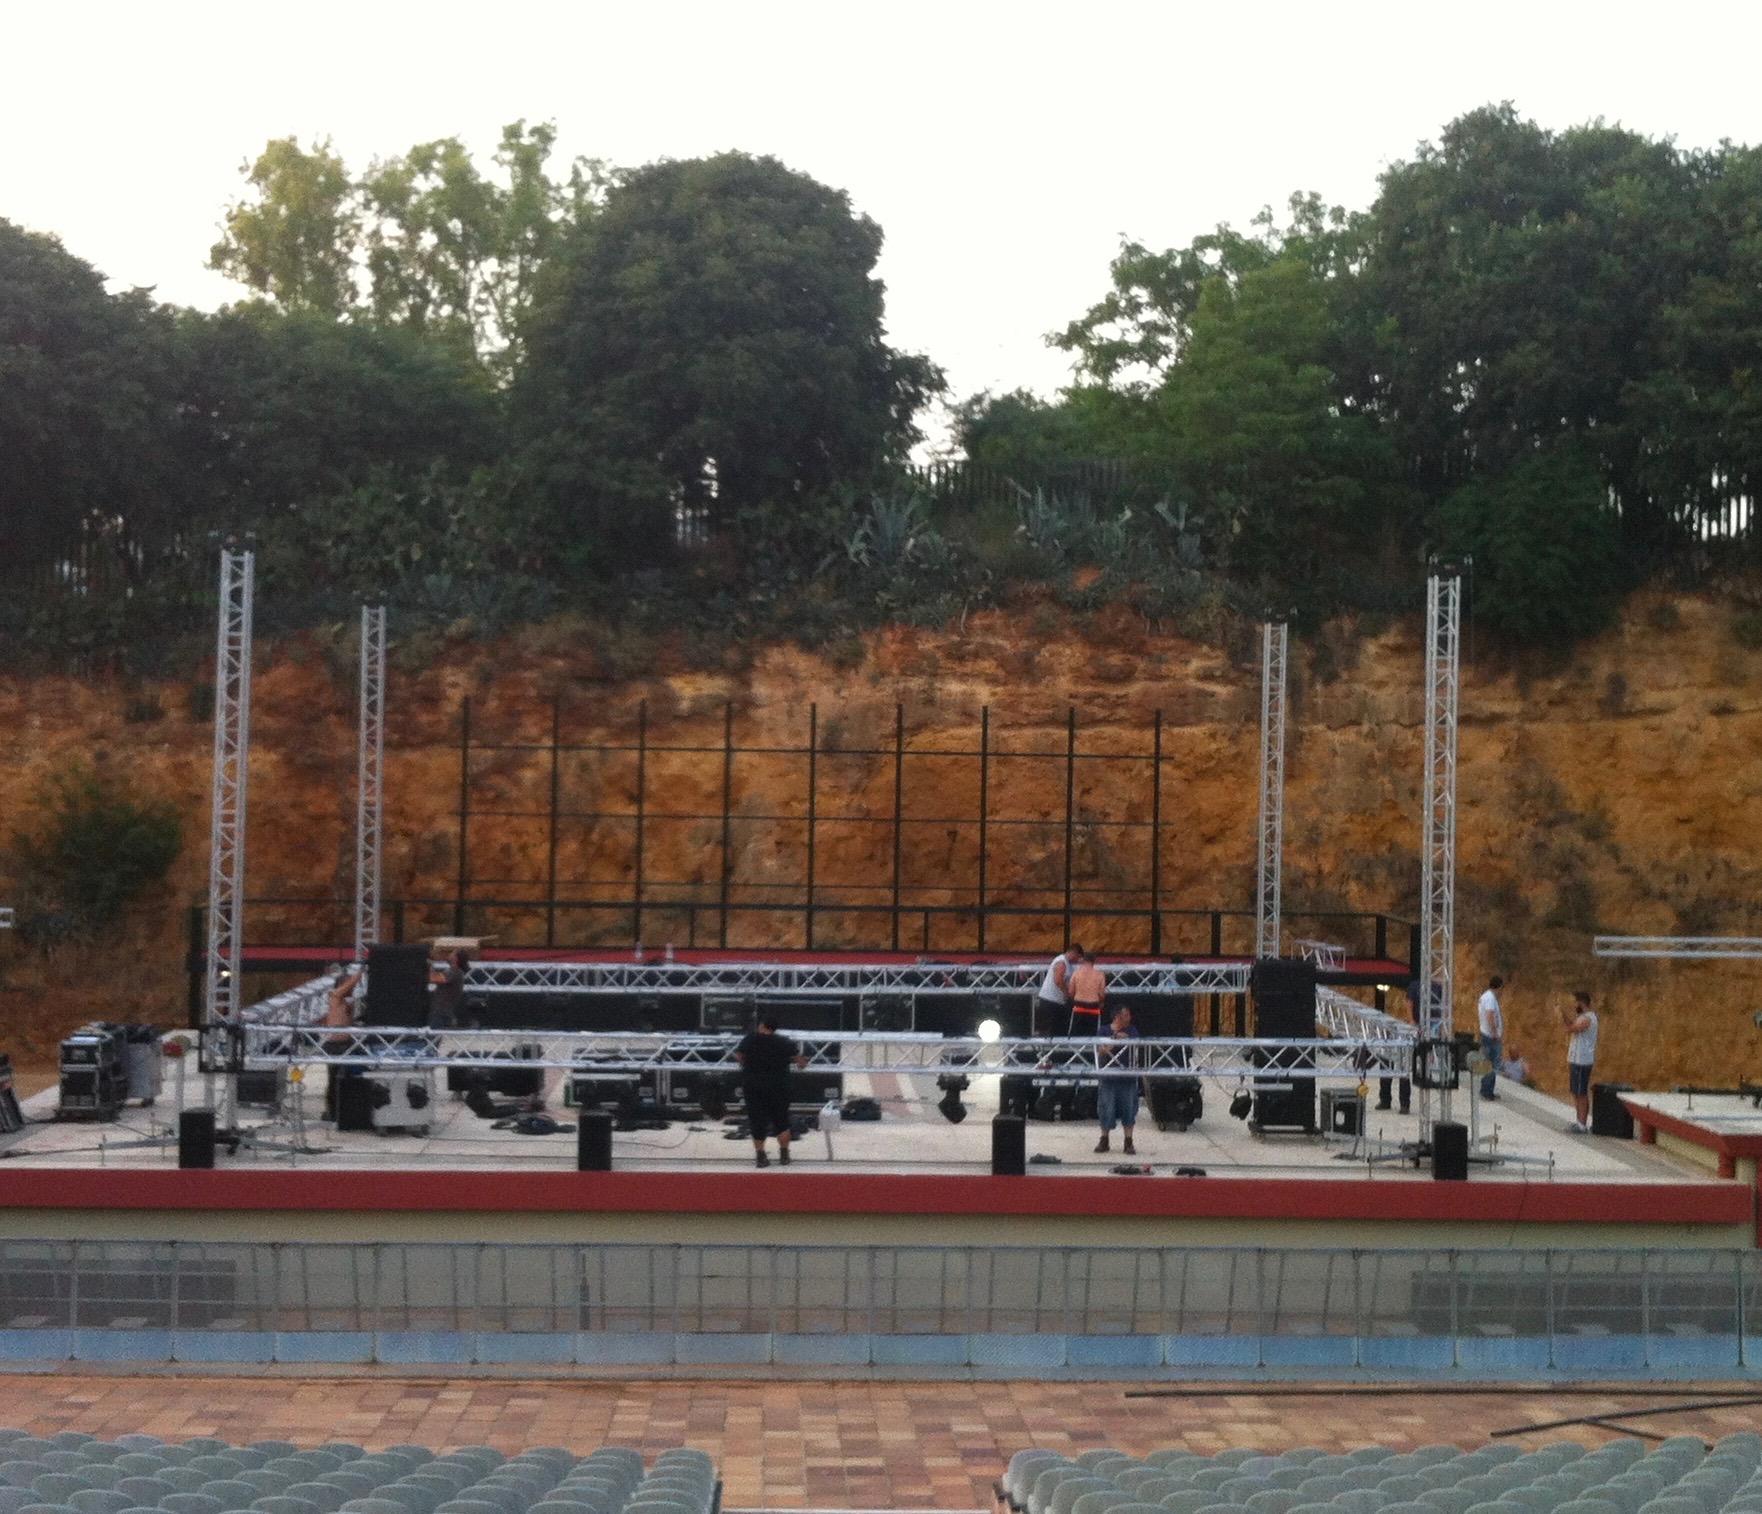 Montaje Auditorio Dos Hermanas (Sevilla)